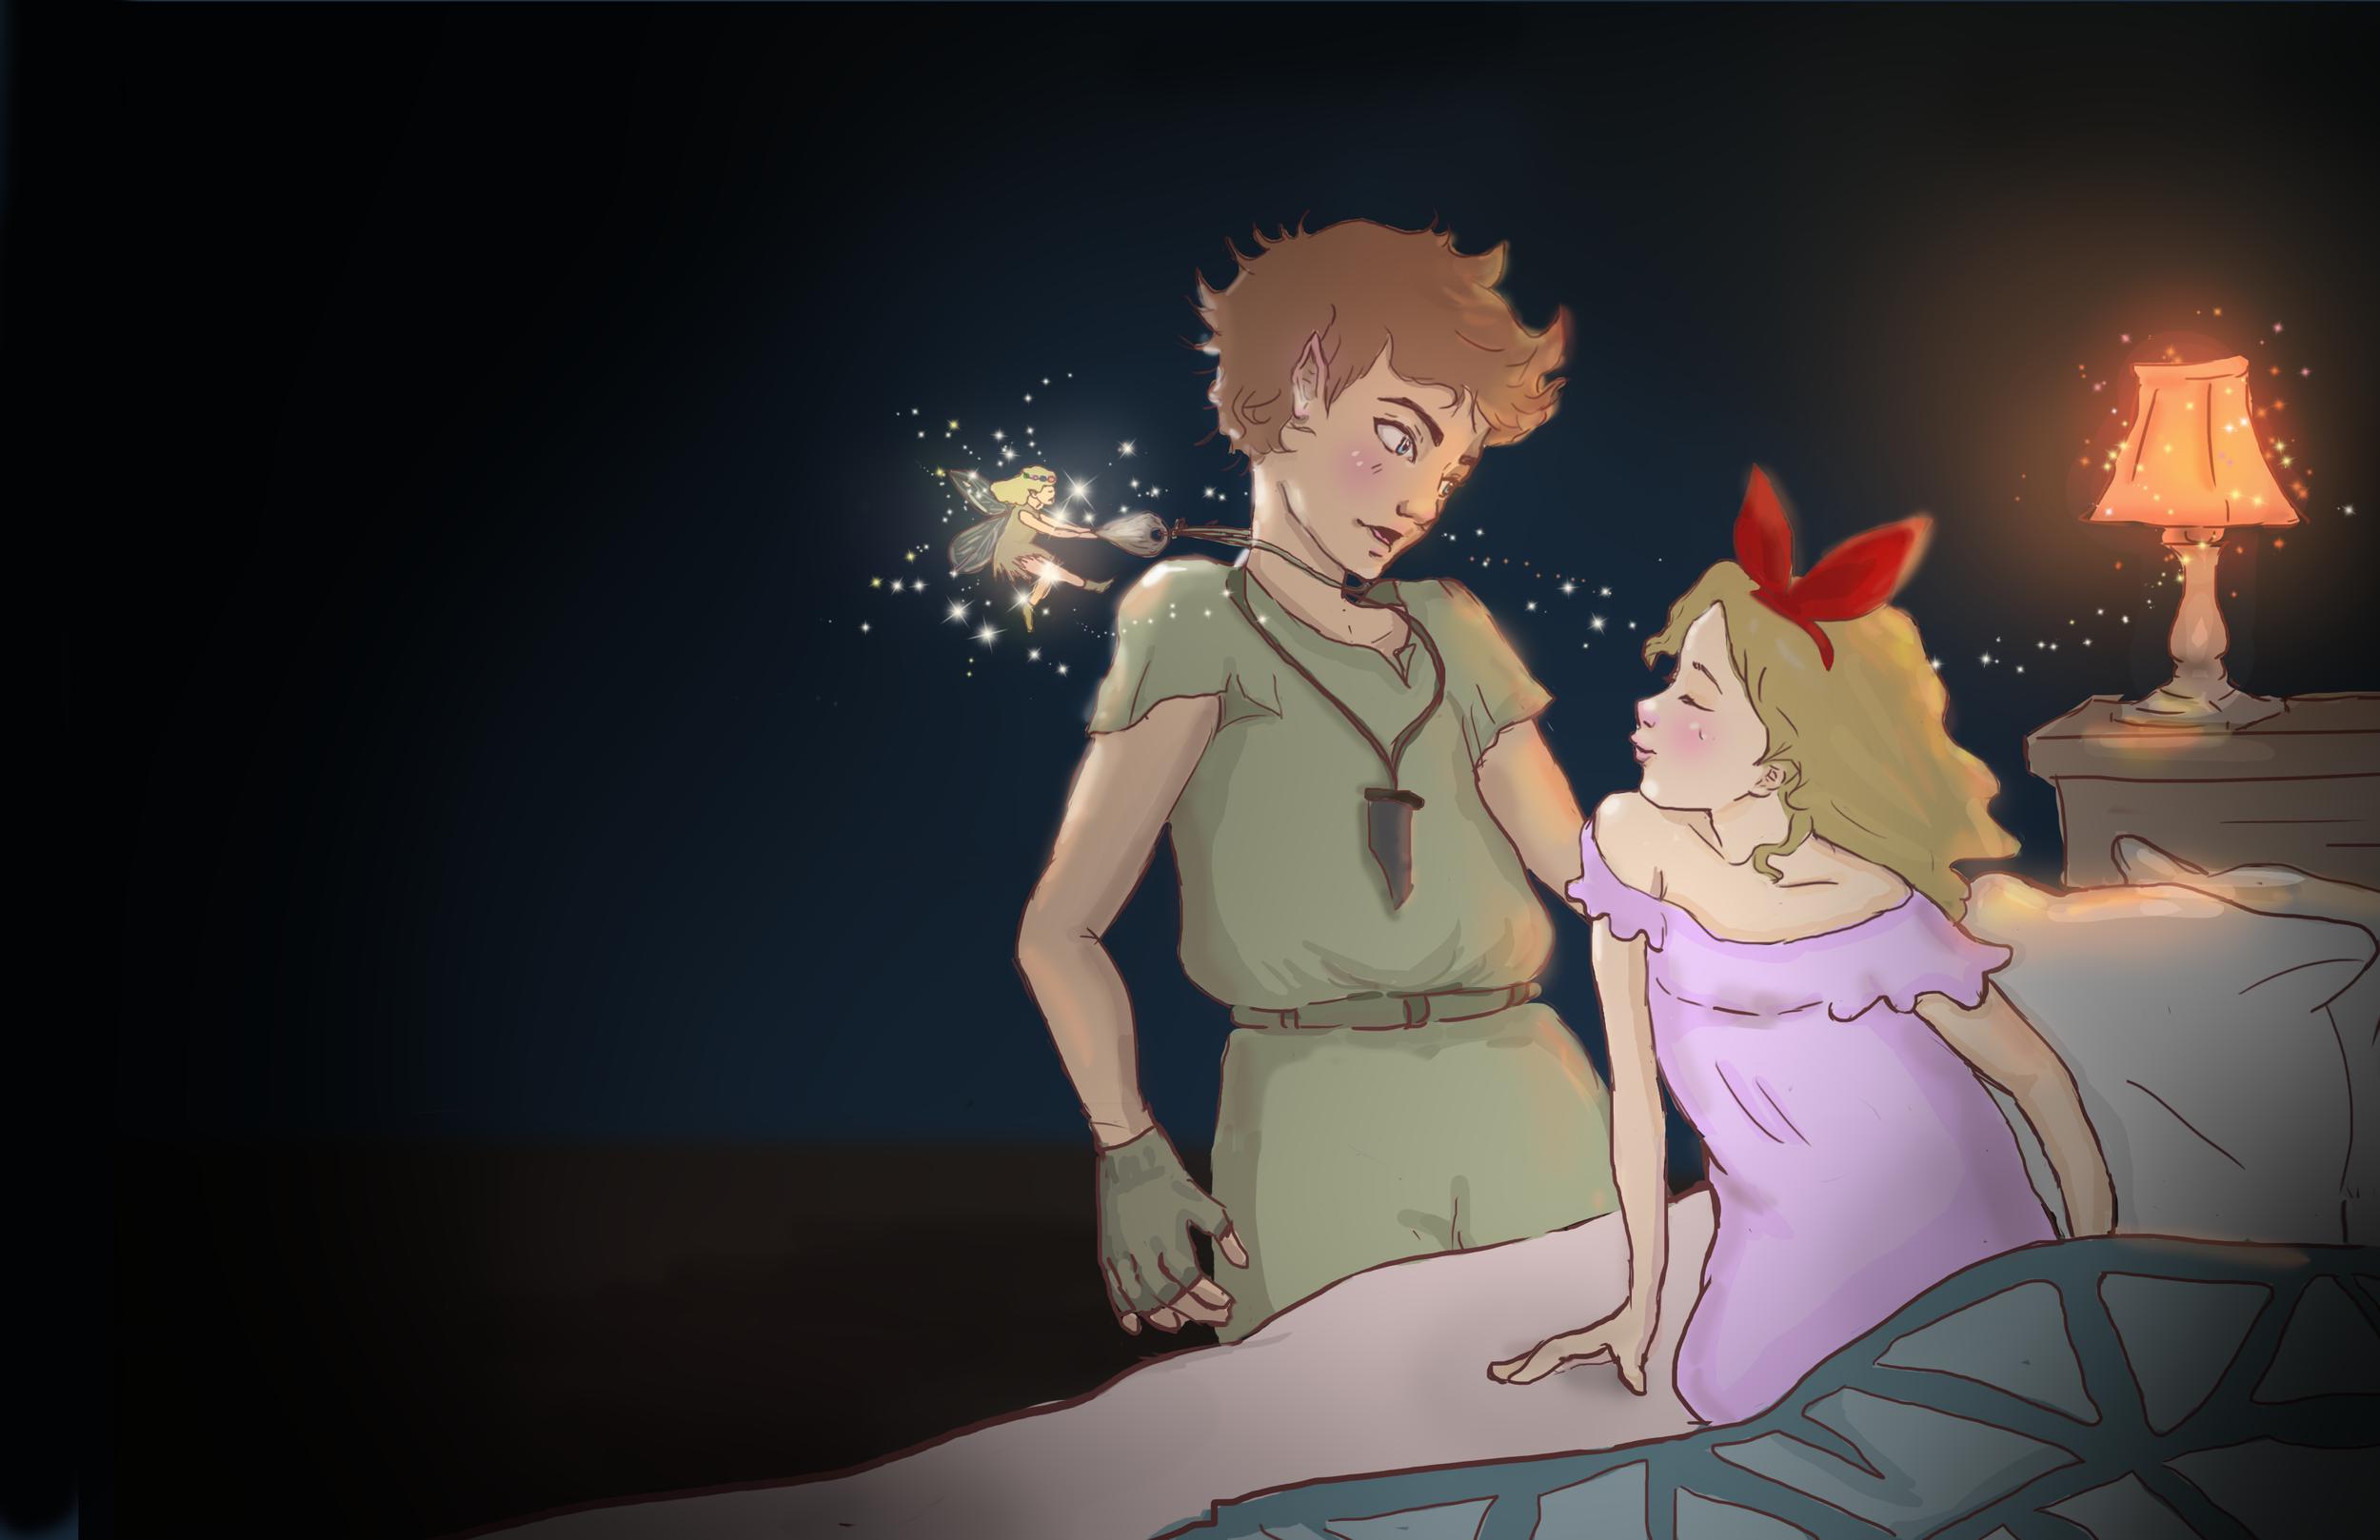 Peter Pan & Wendy | Double Spread